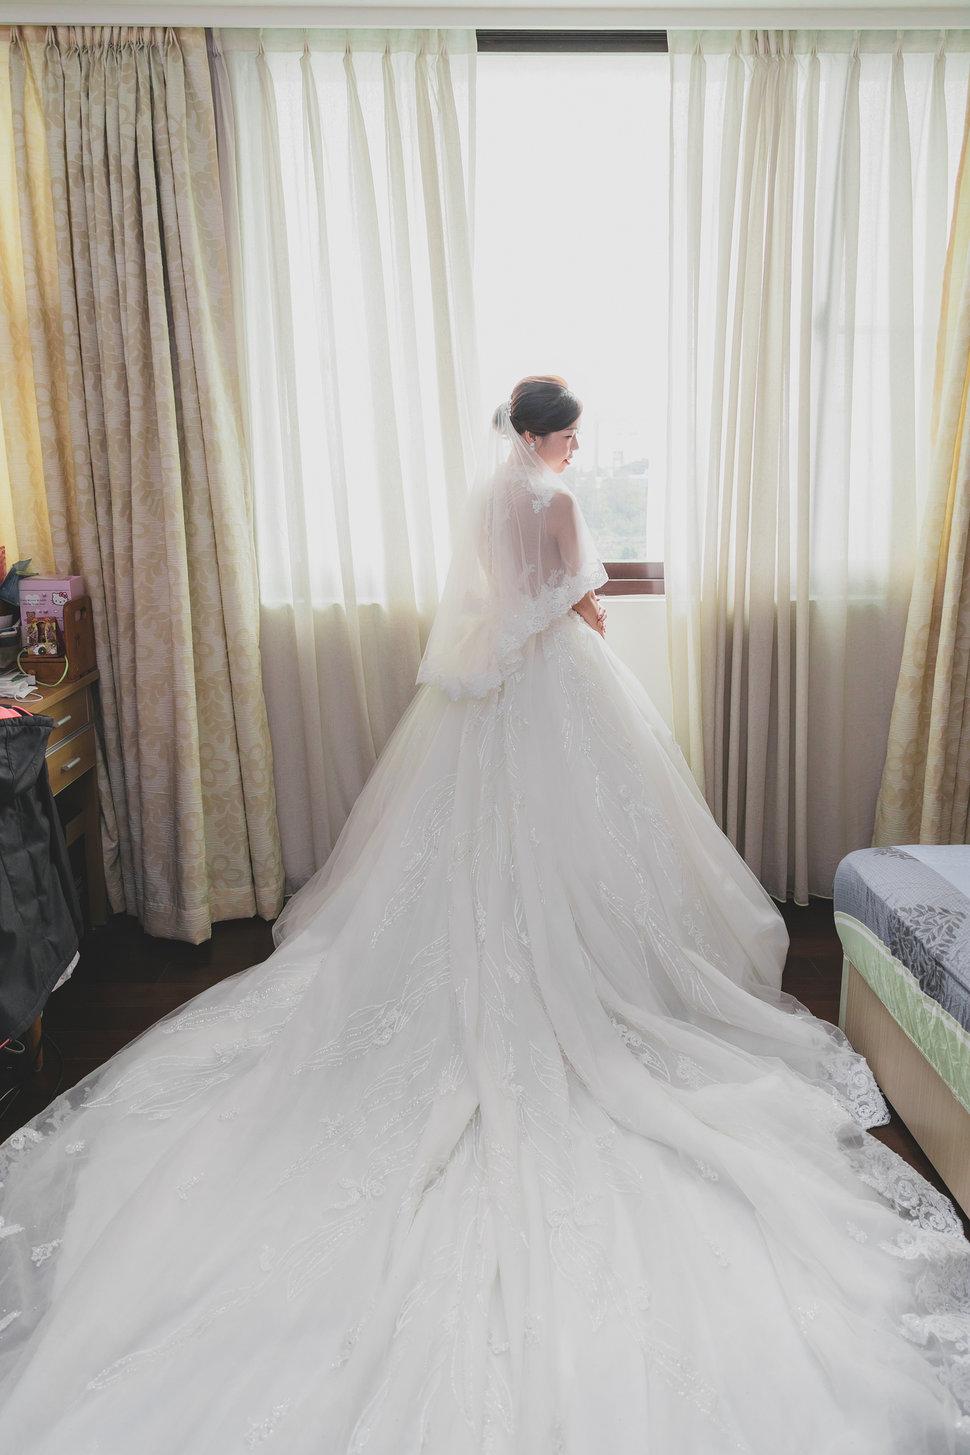 46176027474_8358c5c8b5_k - J Photographer《結婚吧》